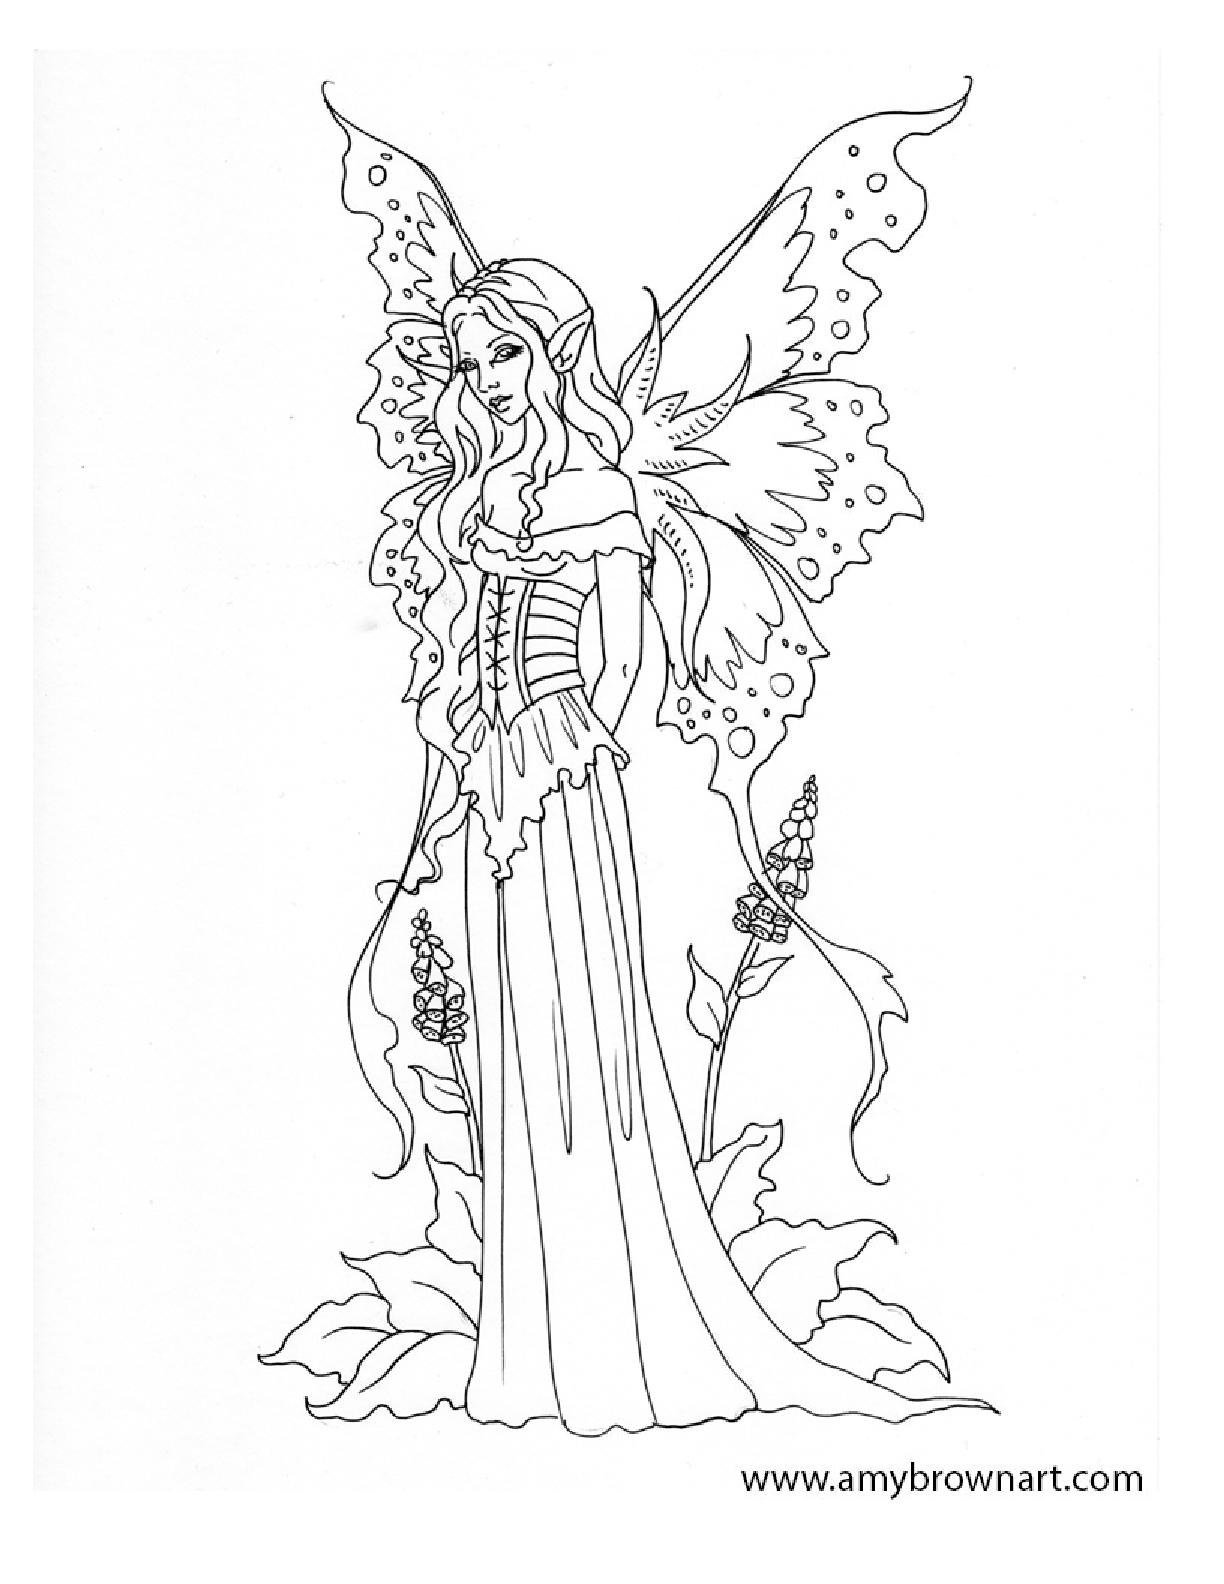 Artist Amy Brown Fantasy Myth Mythical Mystical Legend Elf Elves Dragon Dragons Fairy Fae Wings Fairie Fairy Coloring Pages Fairy Coloring Dragon Coloring Page